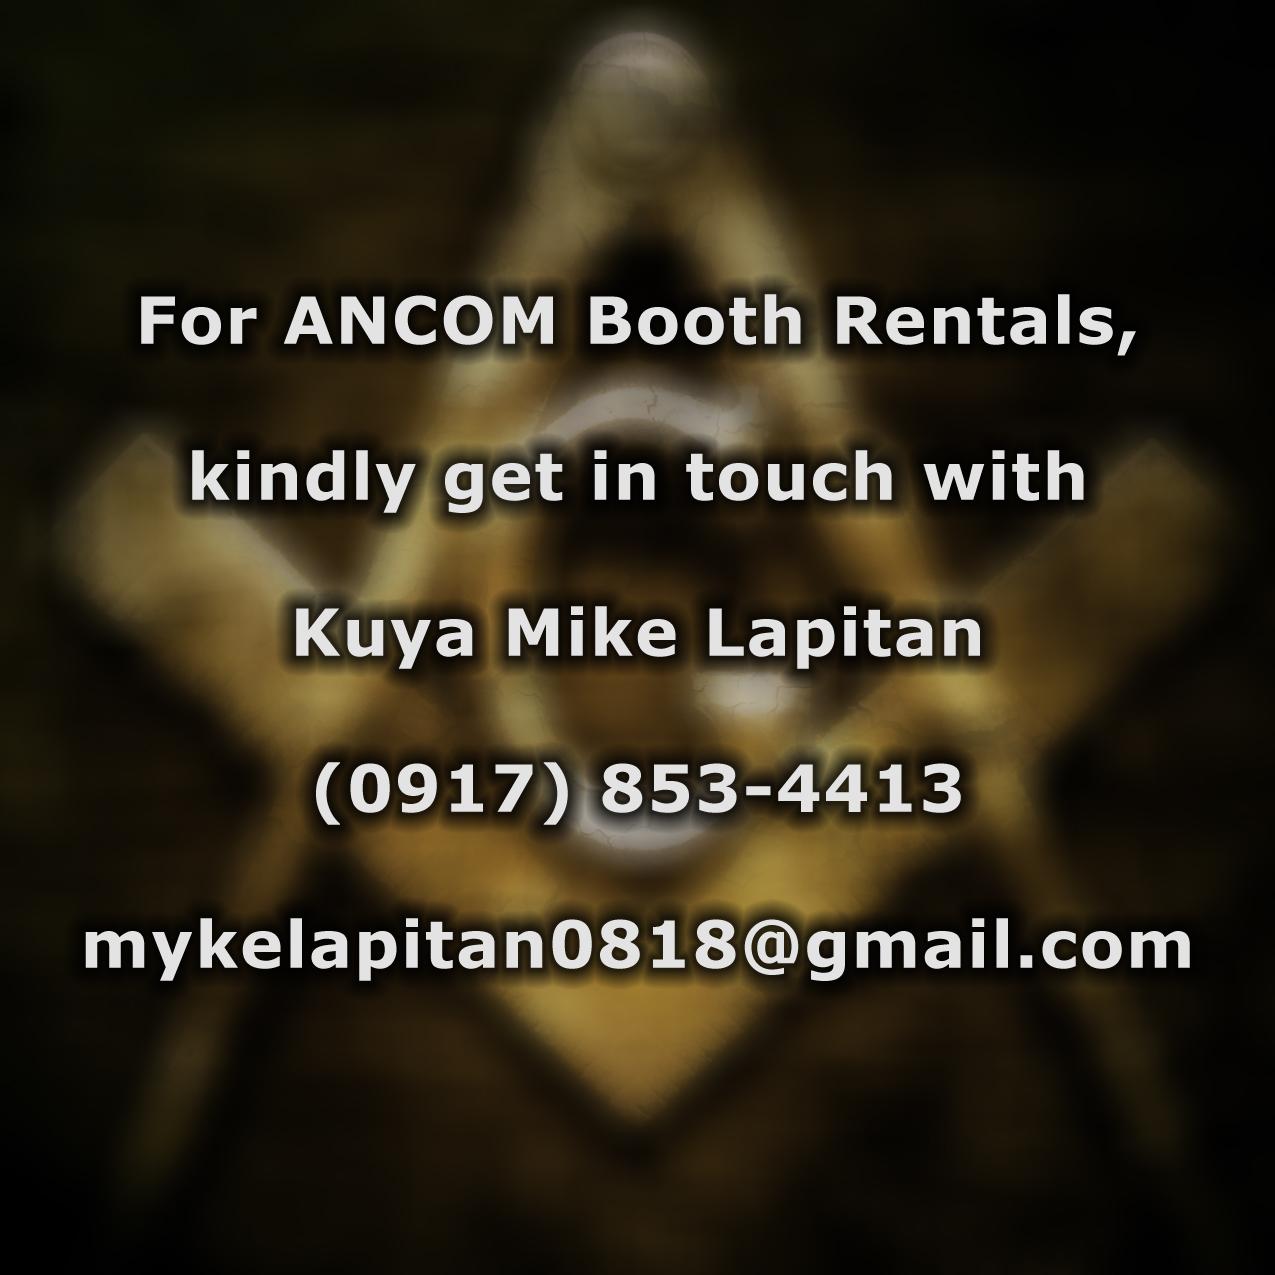 ANCOM 2017 Booth Rentals